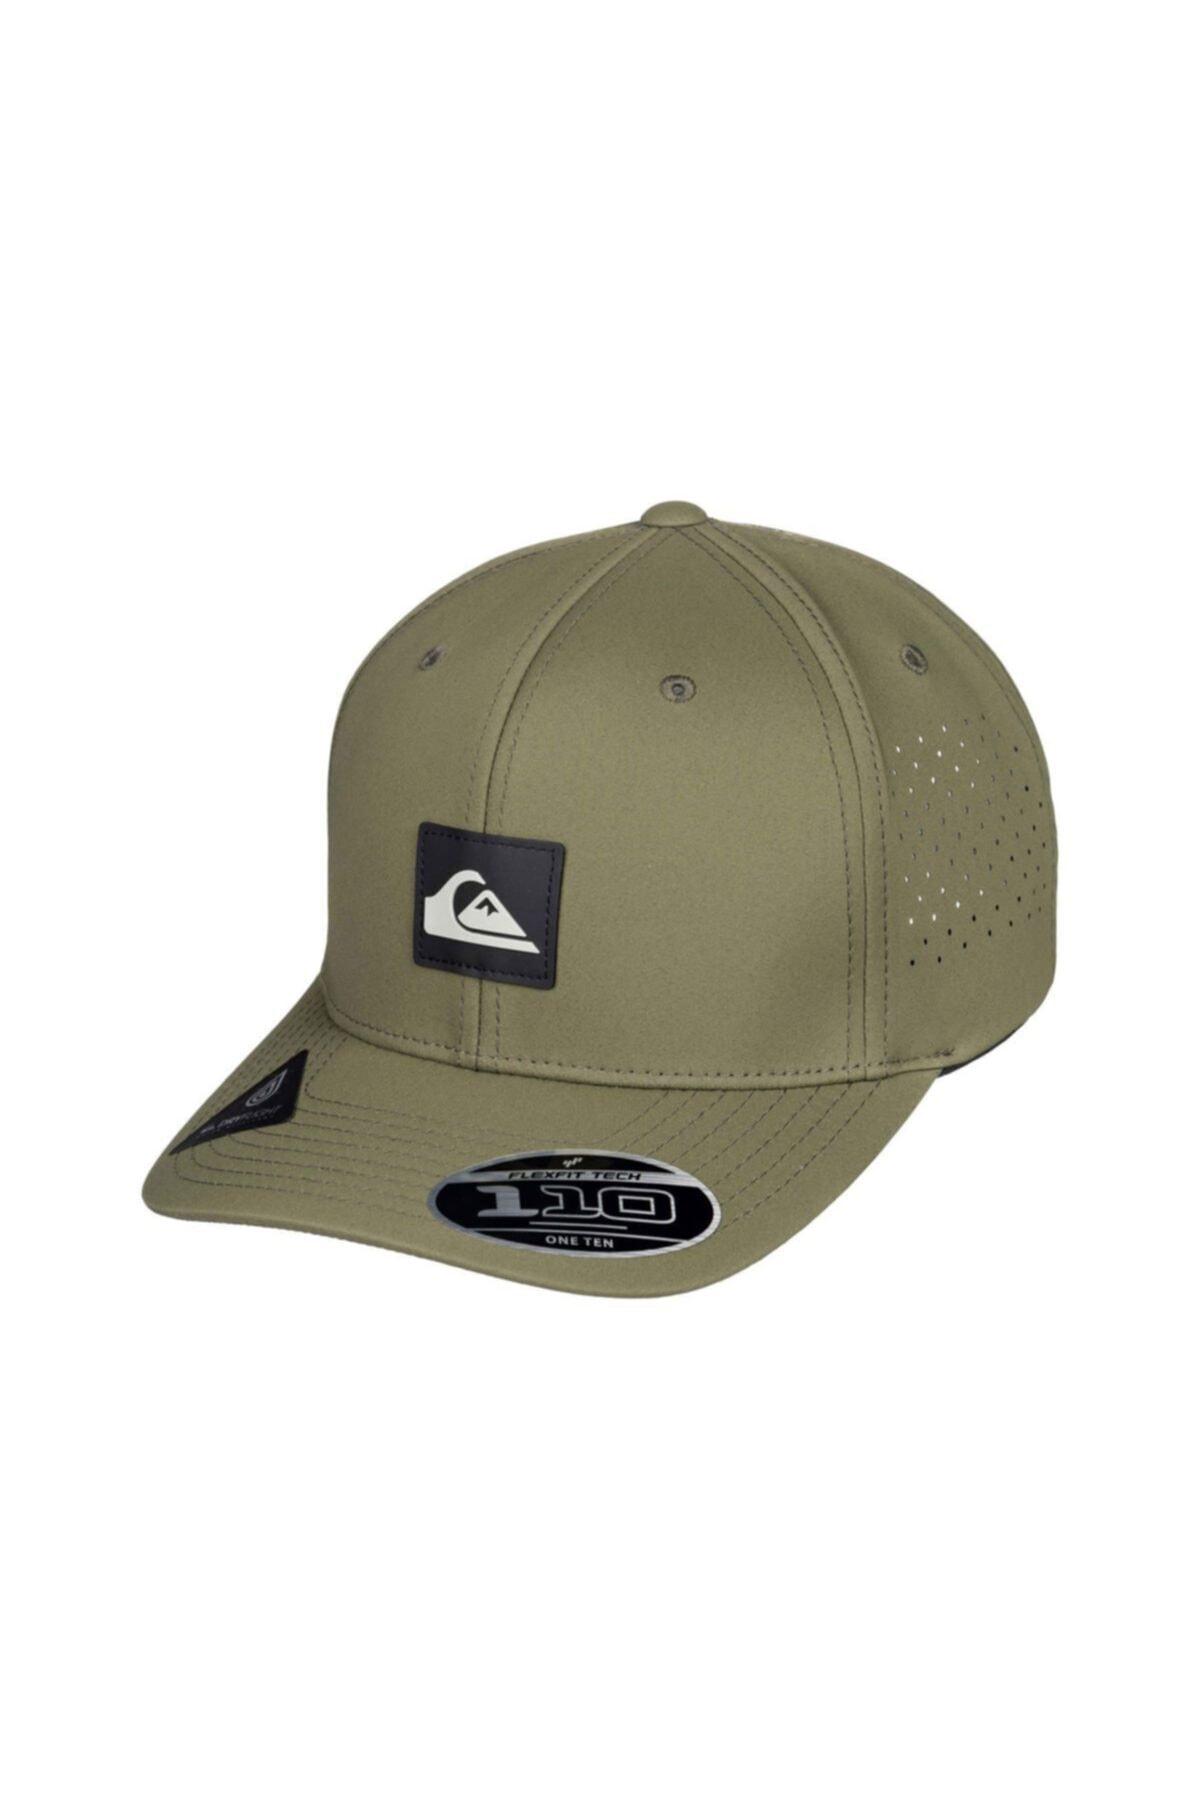 Quiksilver Adapted Şapka 1